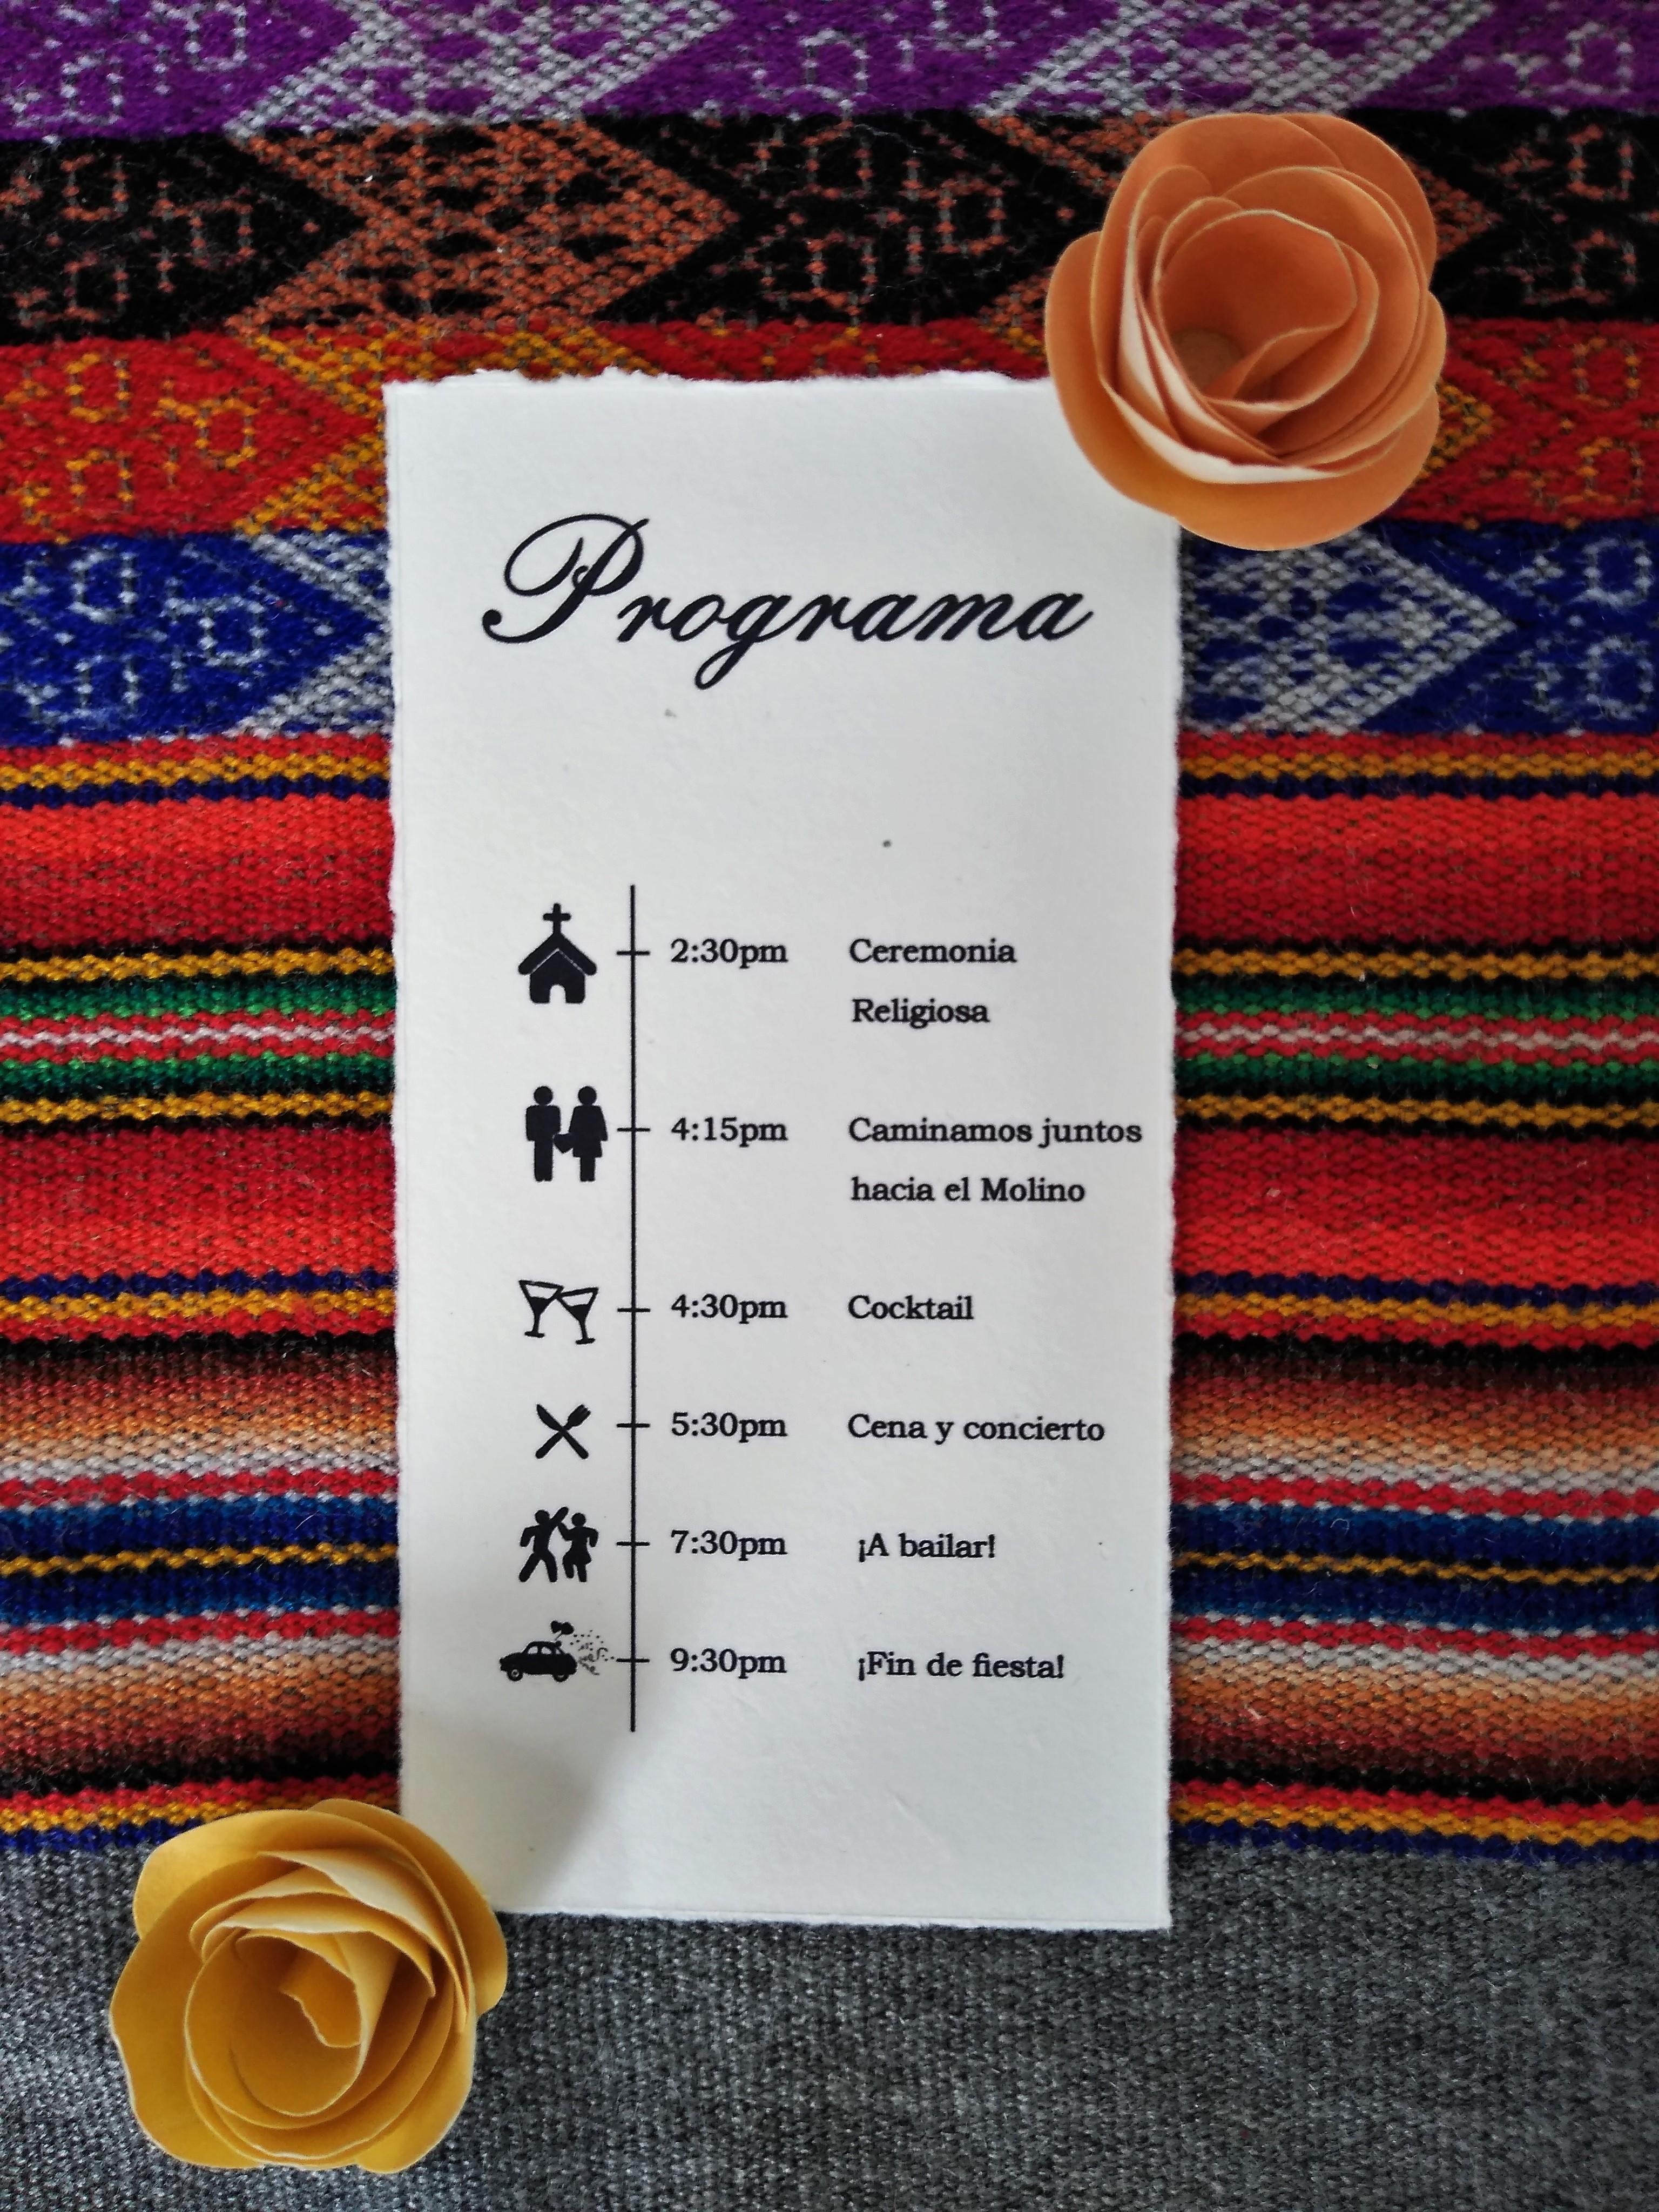 Linea Matrimonial Papeleradonbosco